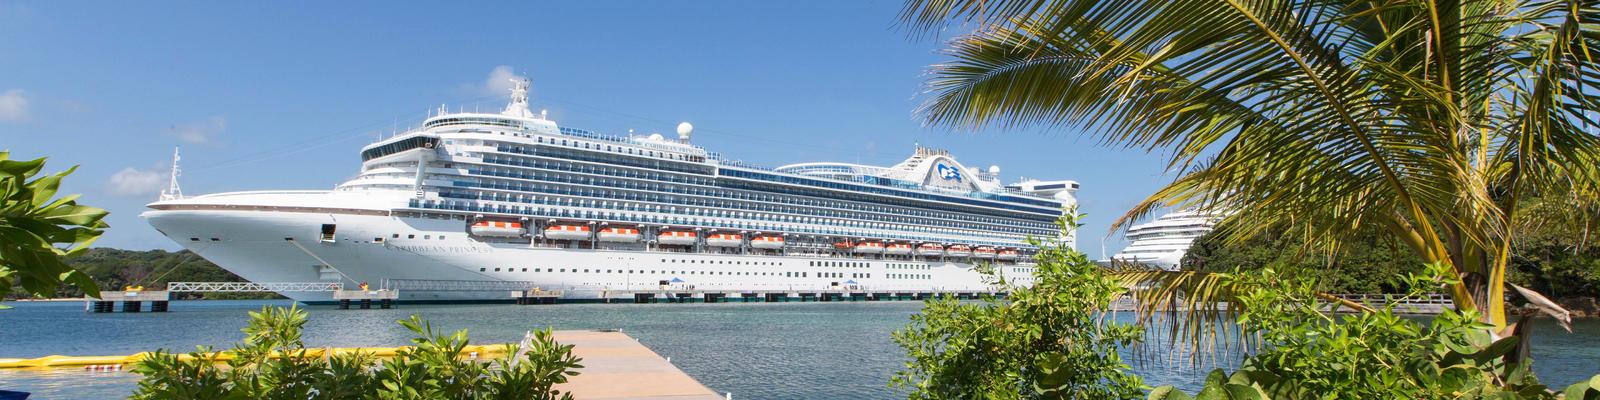 Caribbean Princess (Photo: Cruise Critic)